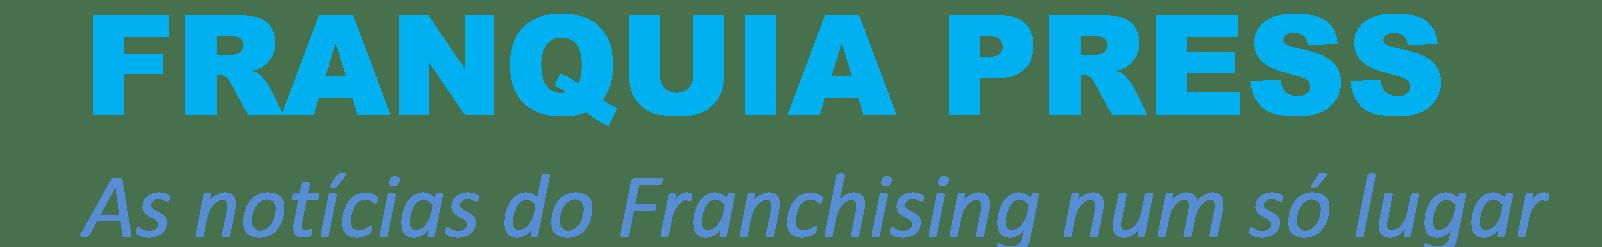 FRANQUIA PRESS